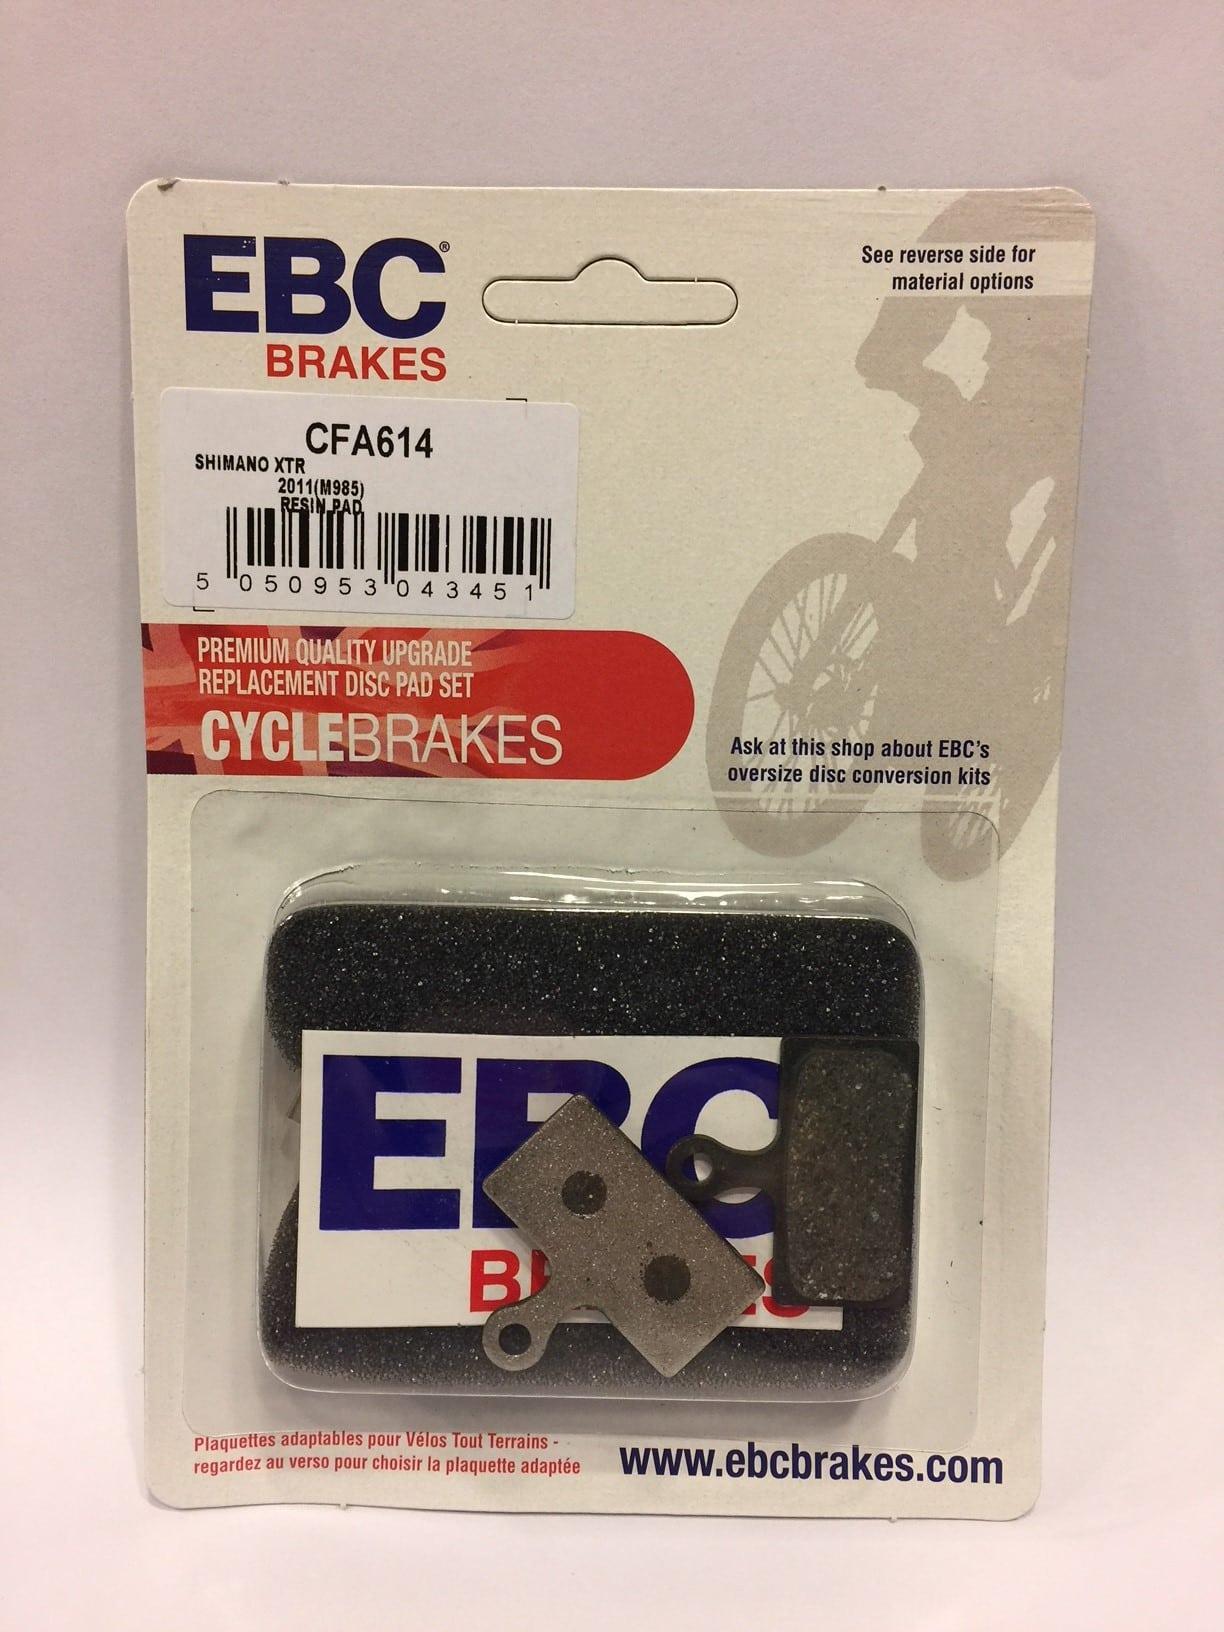 EBC Shimano XTR M985 /& XT M785 2011-2012 MTB Disc Brake Pads CFA614